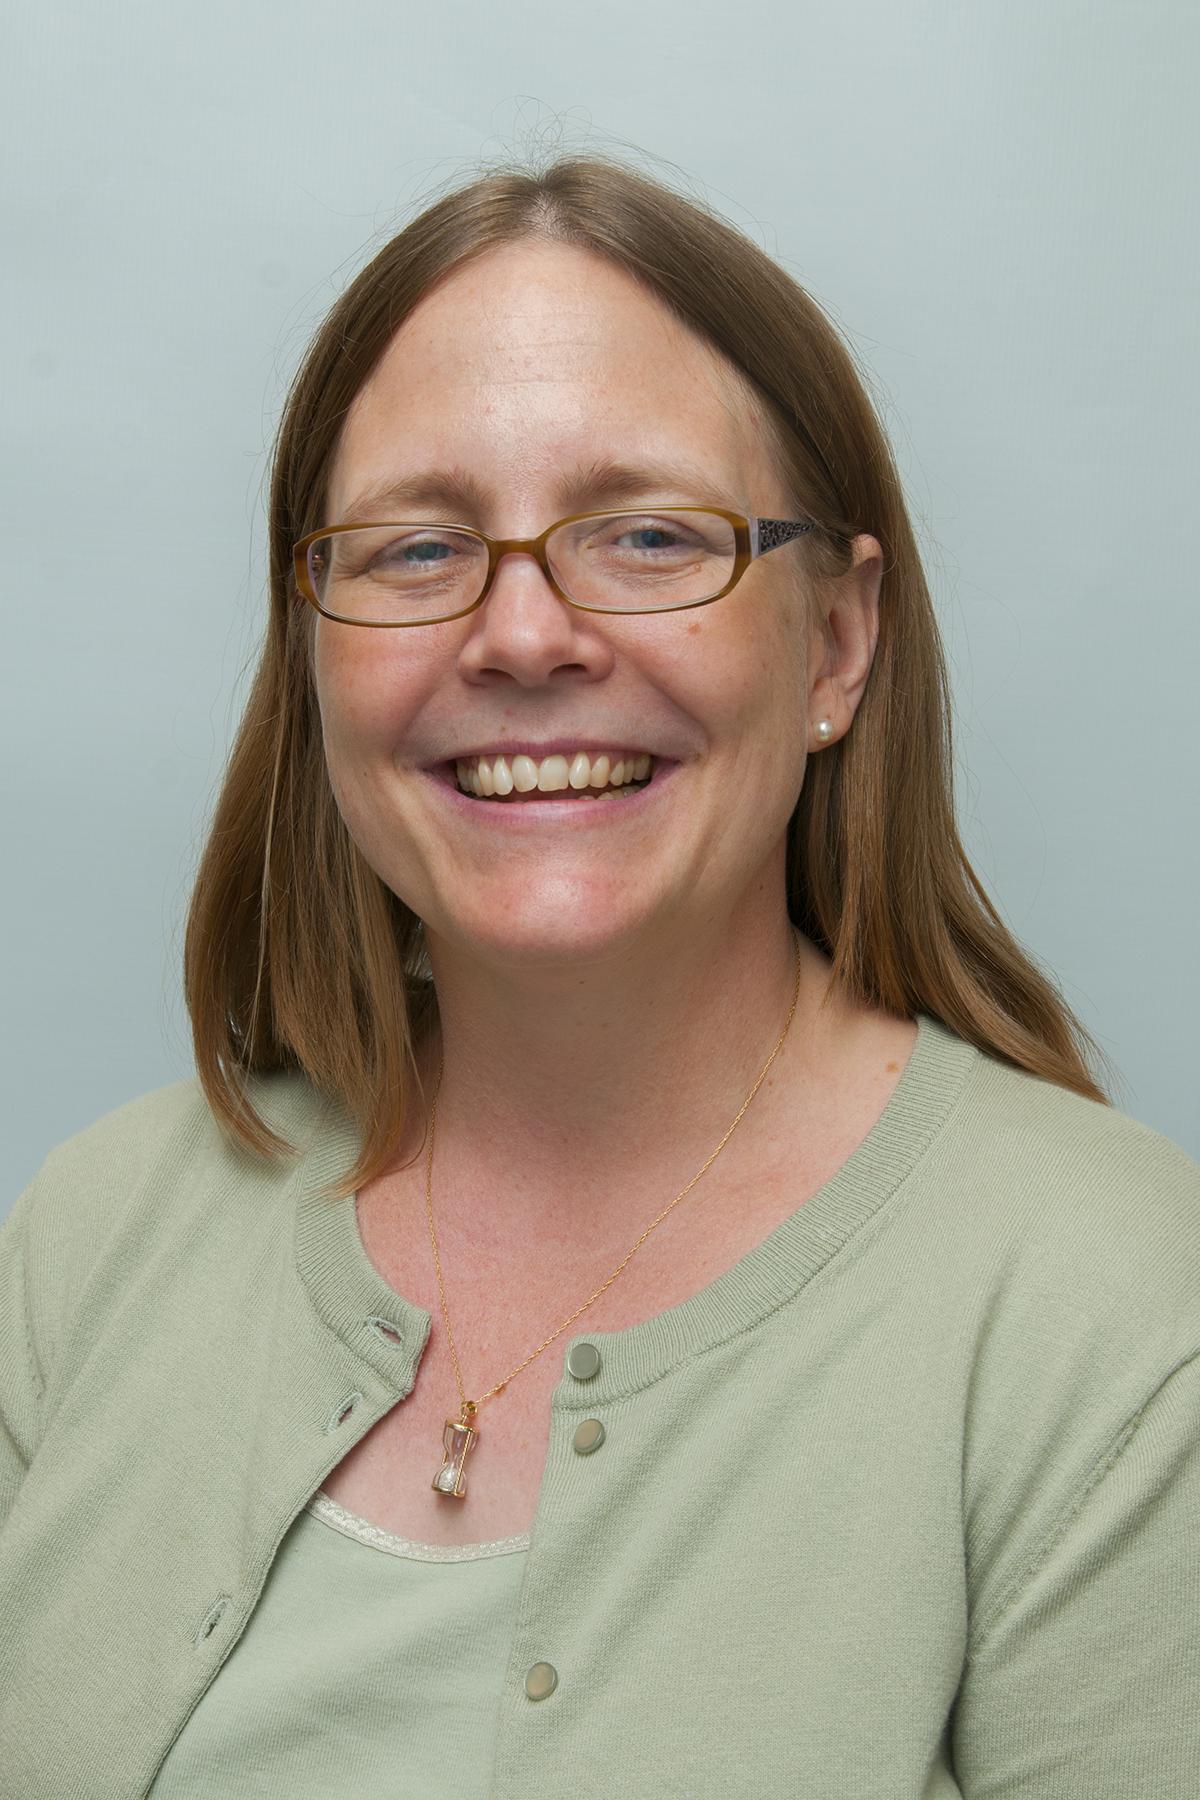 Shannon Scott-Vernaglia, MD; MGHfC Pediatric Residency Program Director